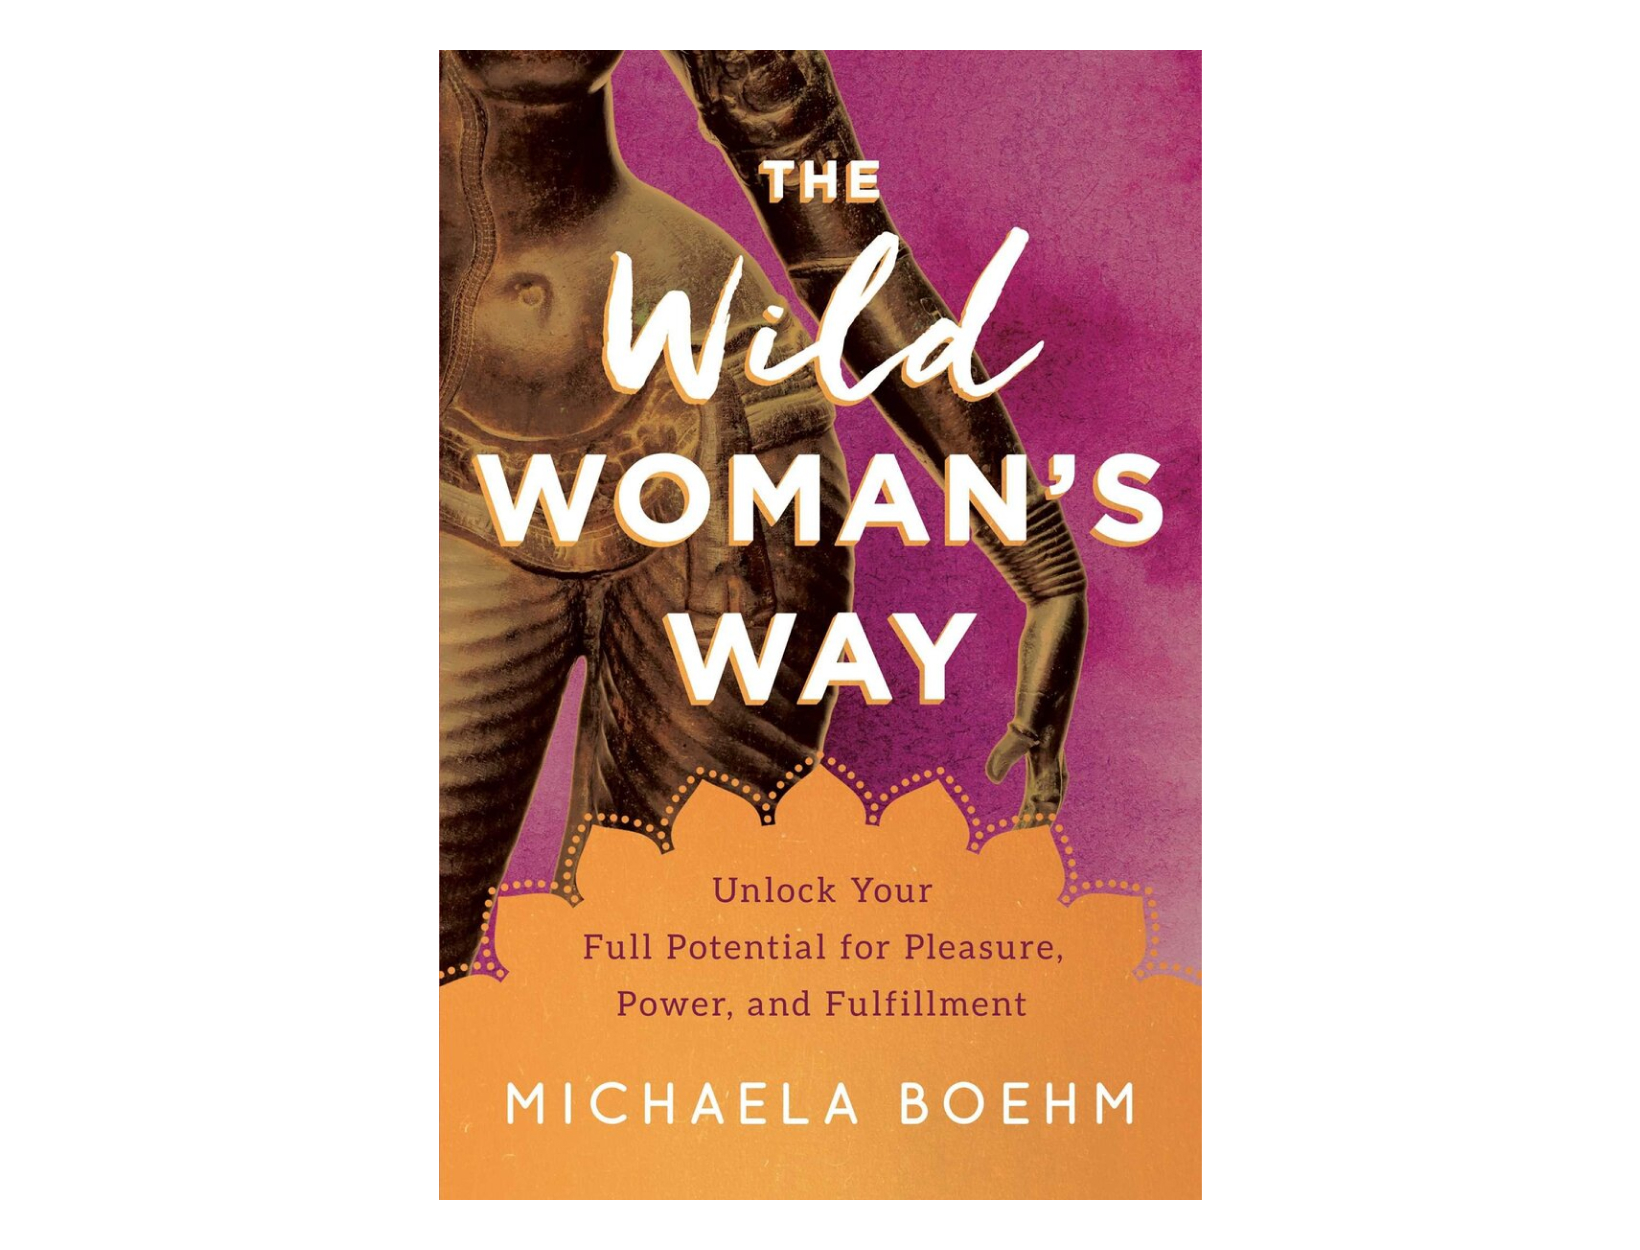 <em>The Wild Woman's Way</em> by Michaela Boehm